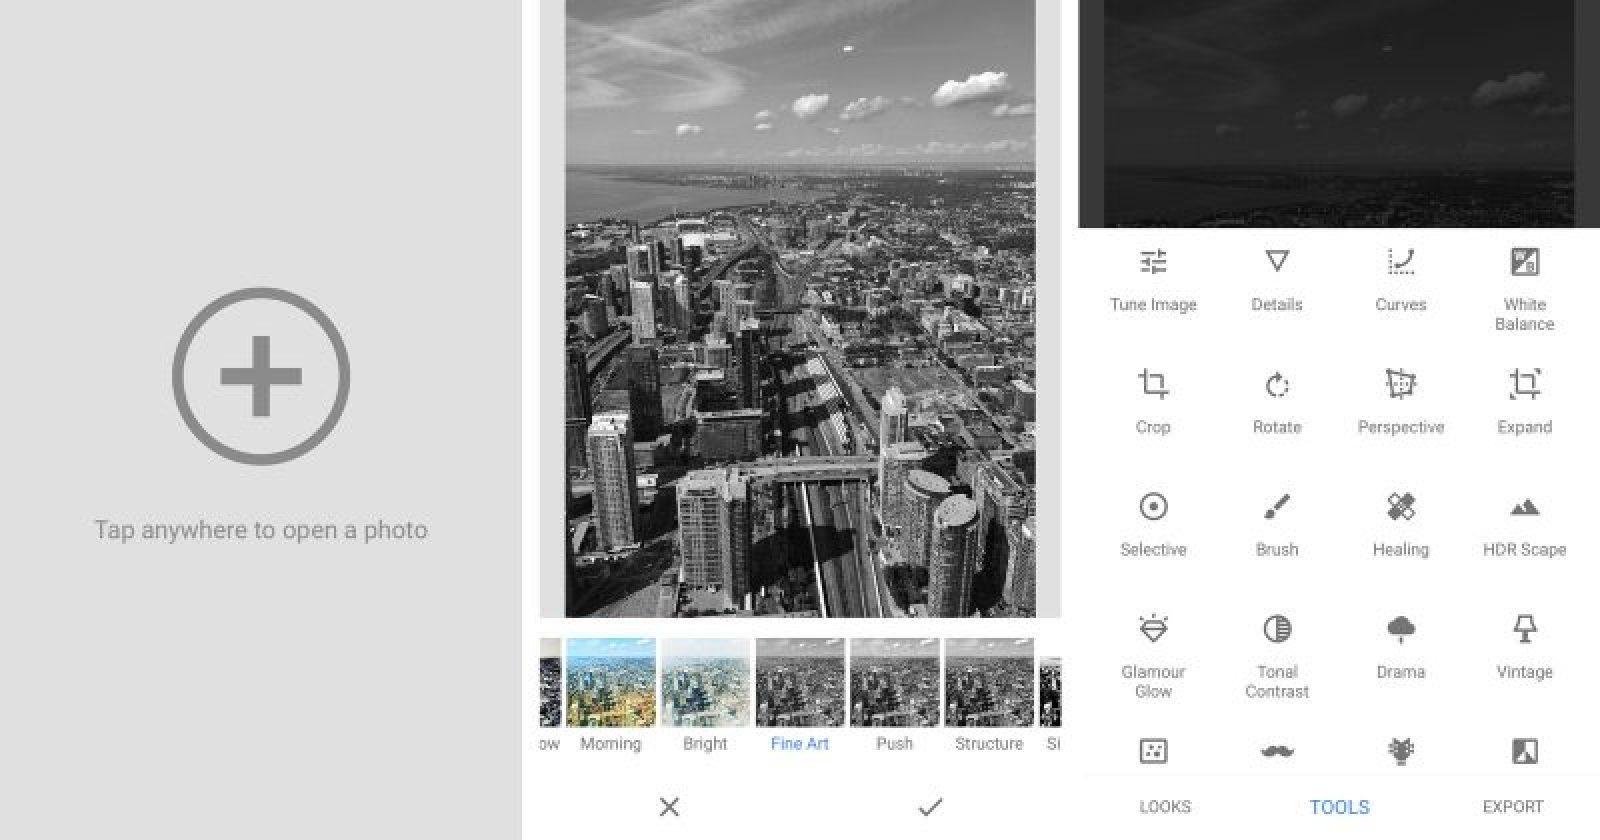 App di Google: Snapseed